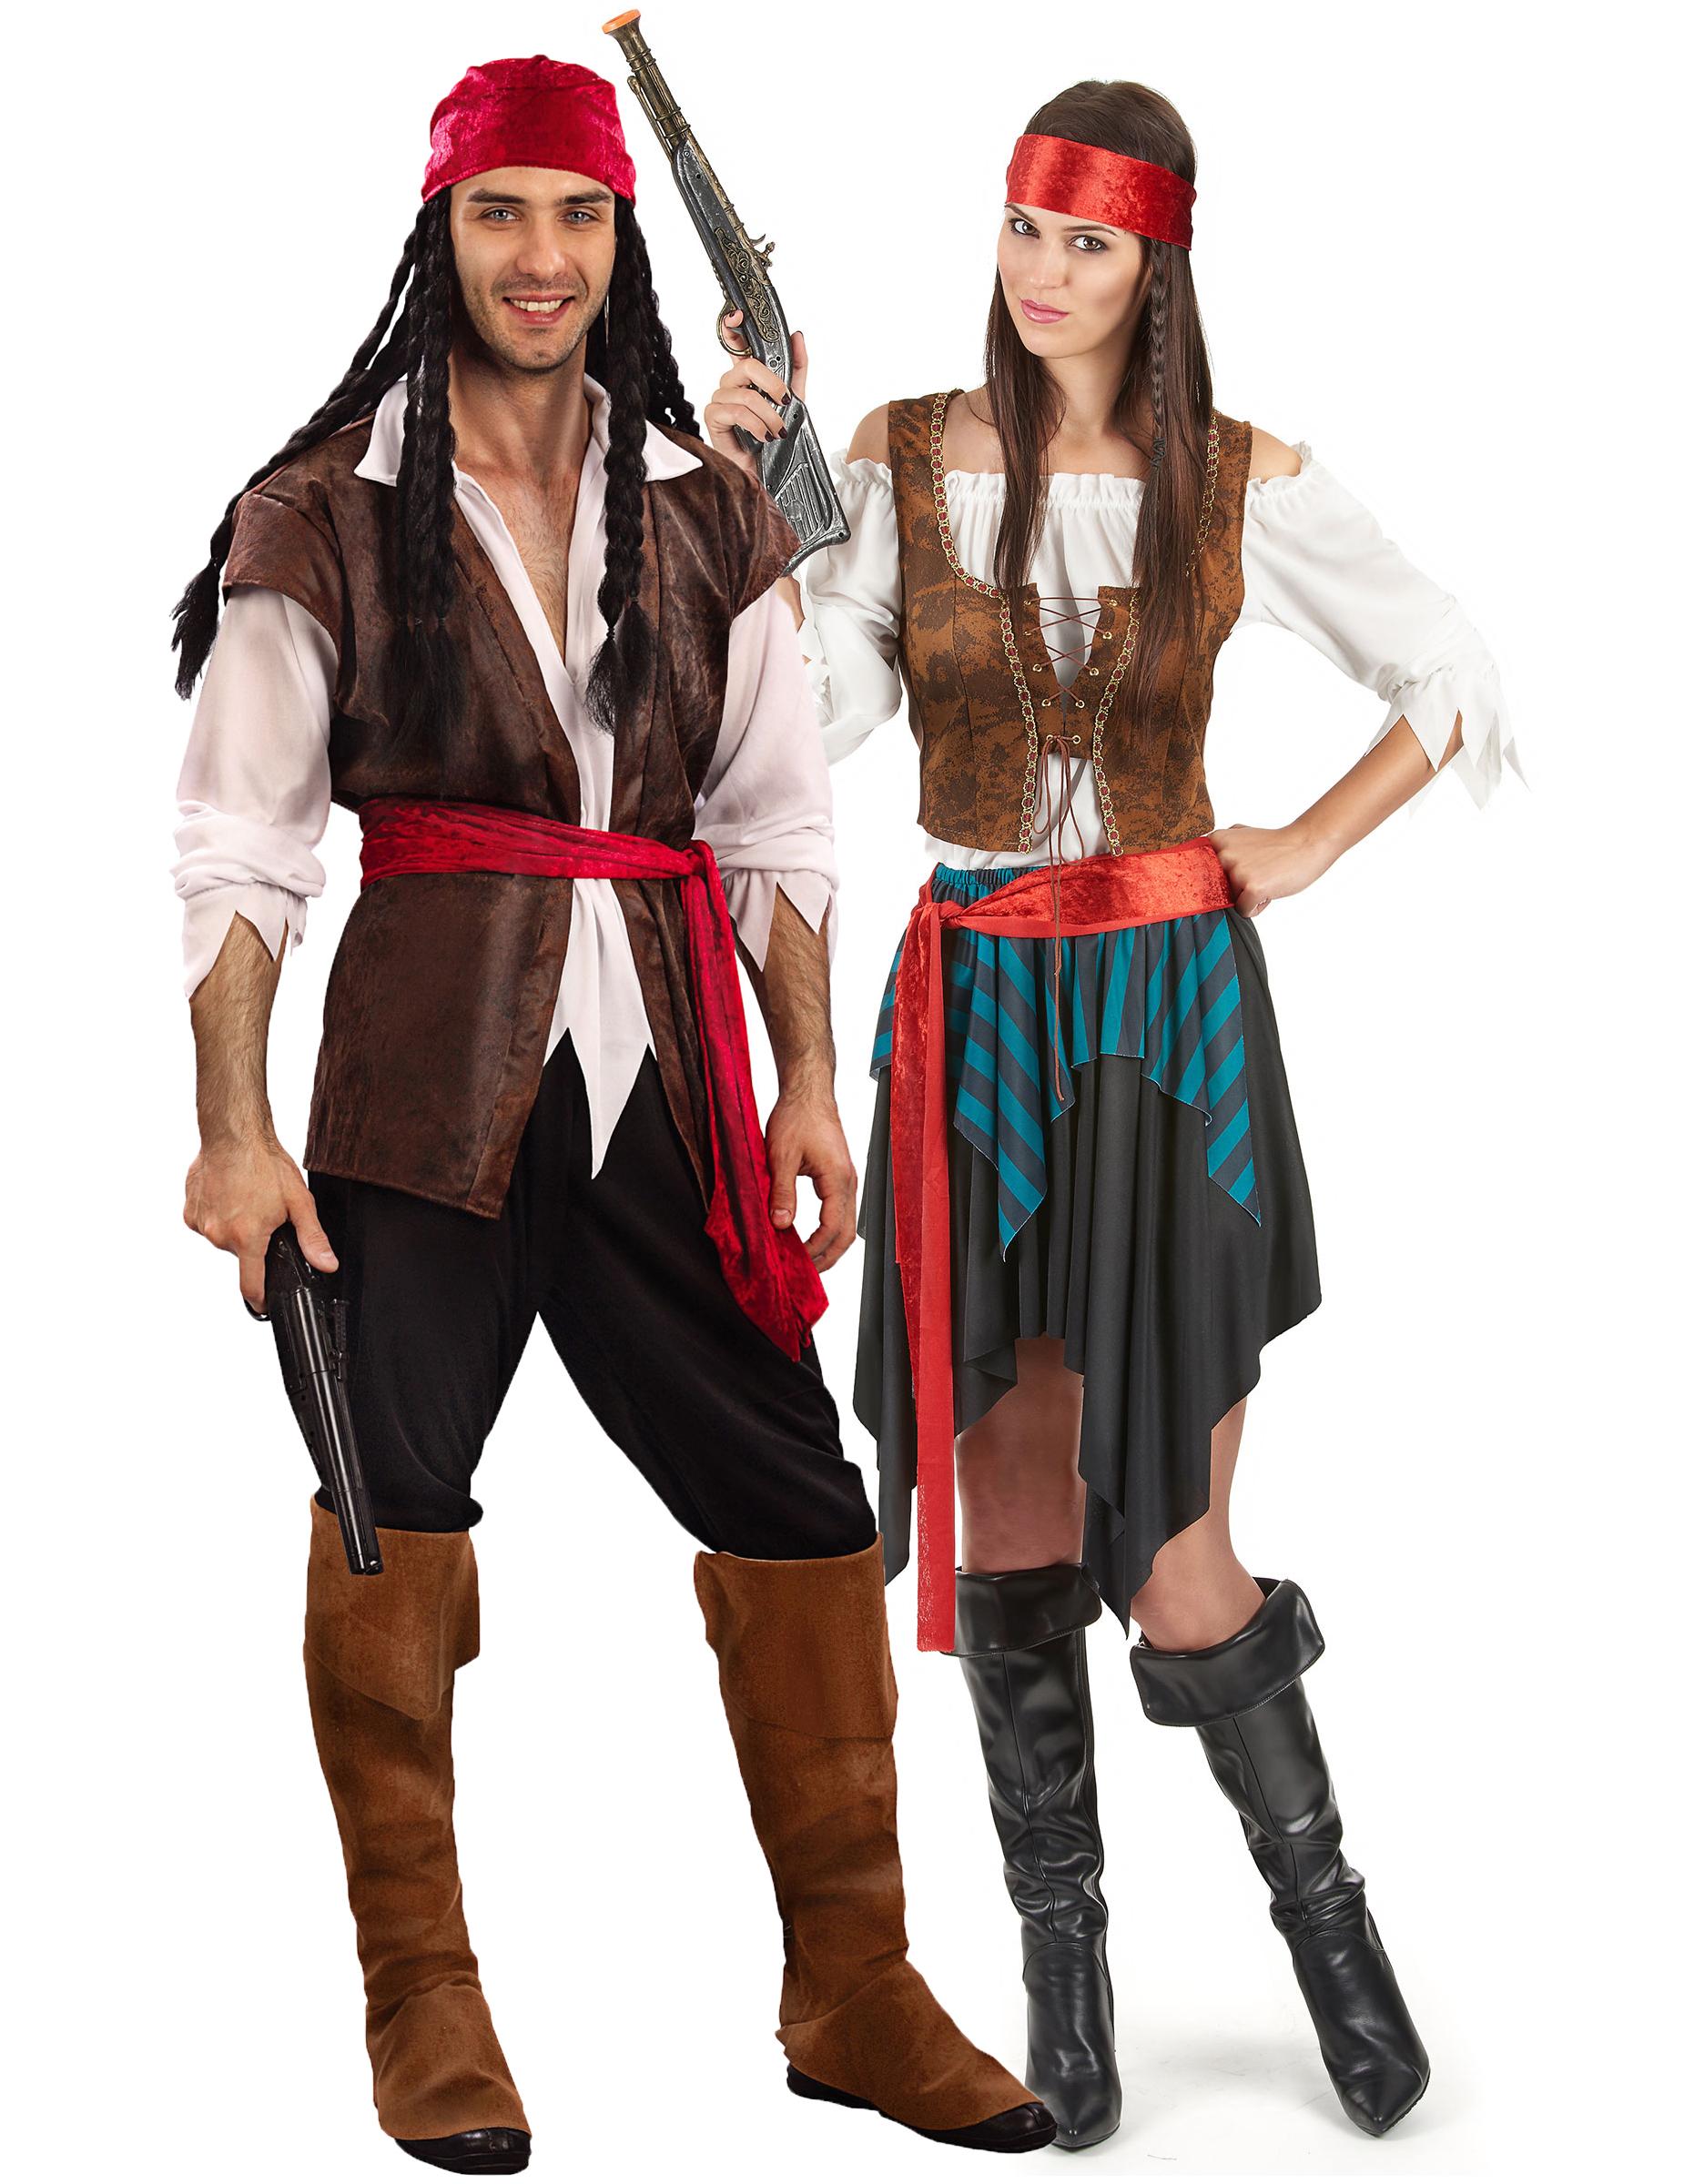 d50168493d Vestiti di Carnevale di coppia e travestimenti di gruppo originali ...